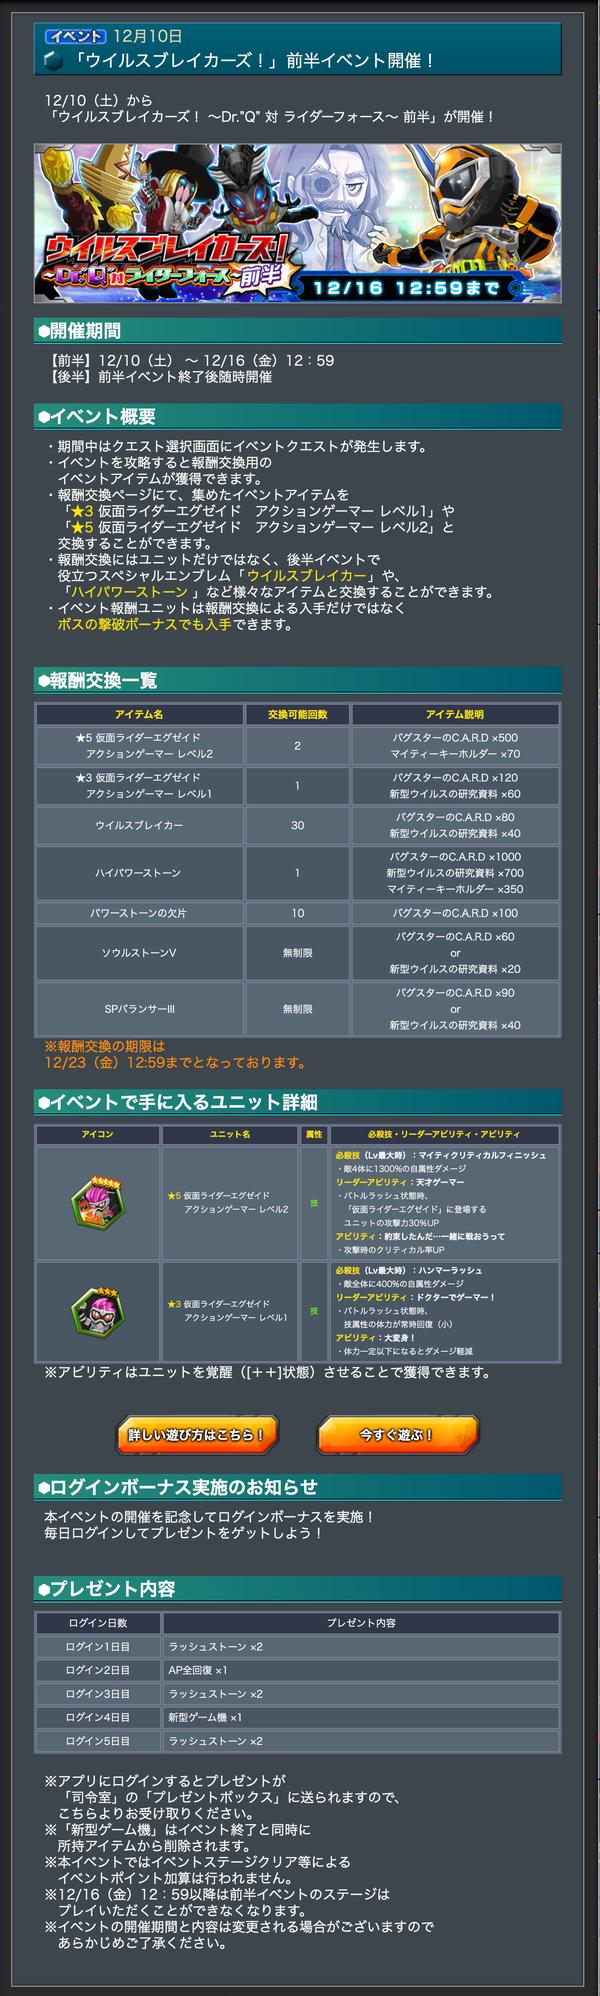 f:id:ich-ichi:20161212165745p:plain